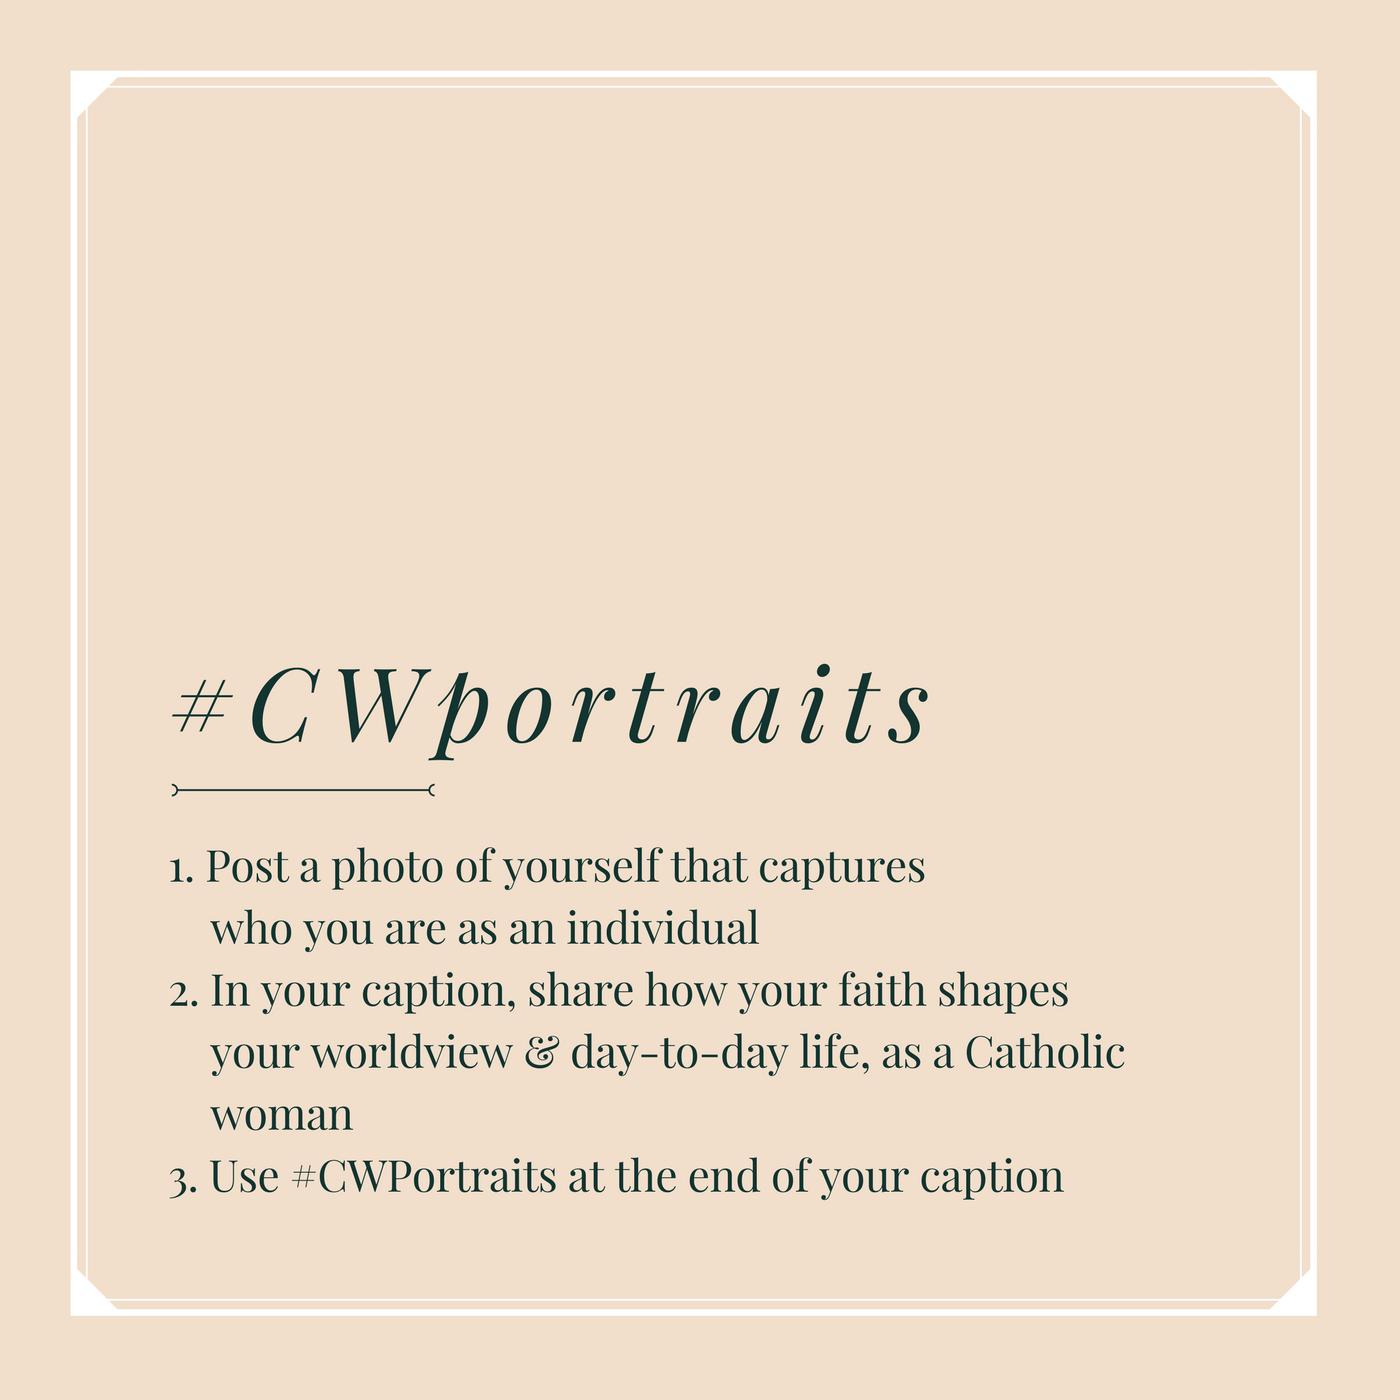 #CWportraits instructions